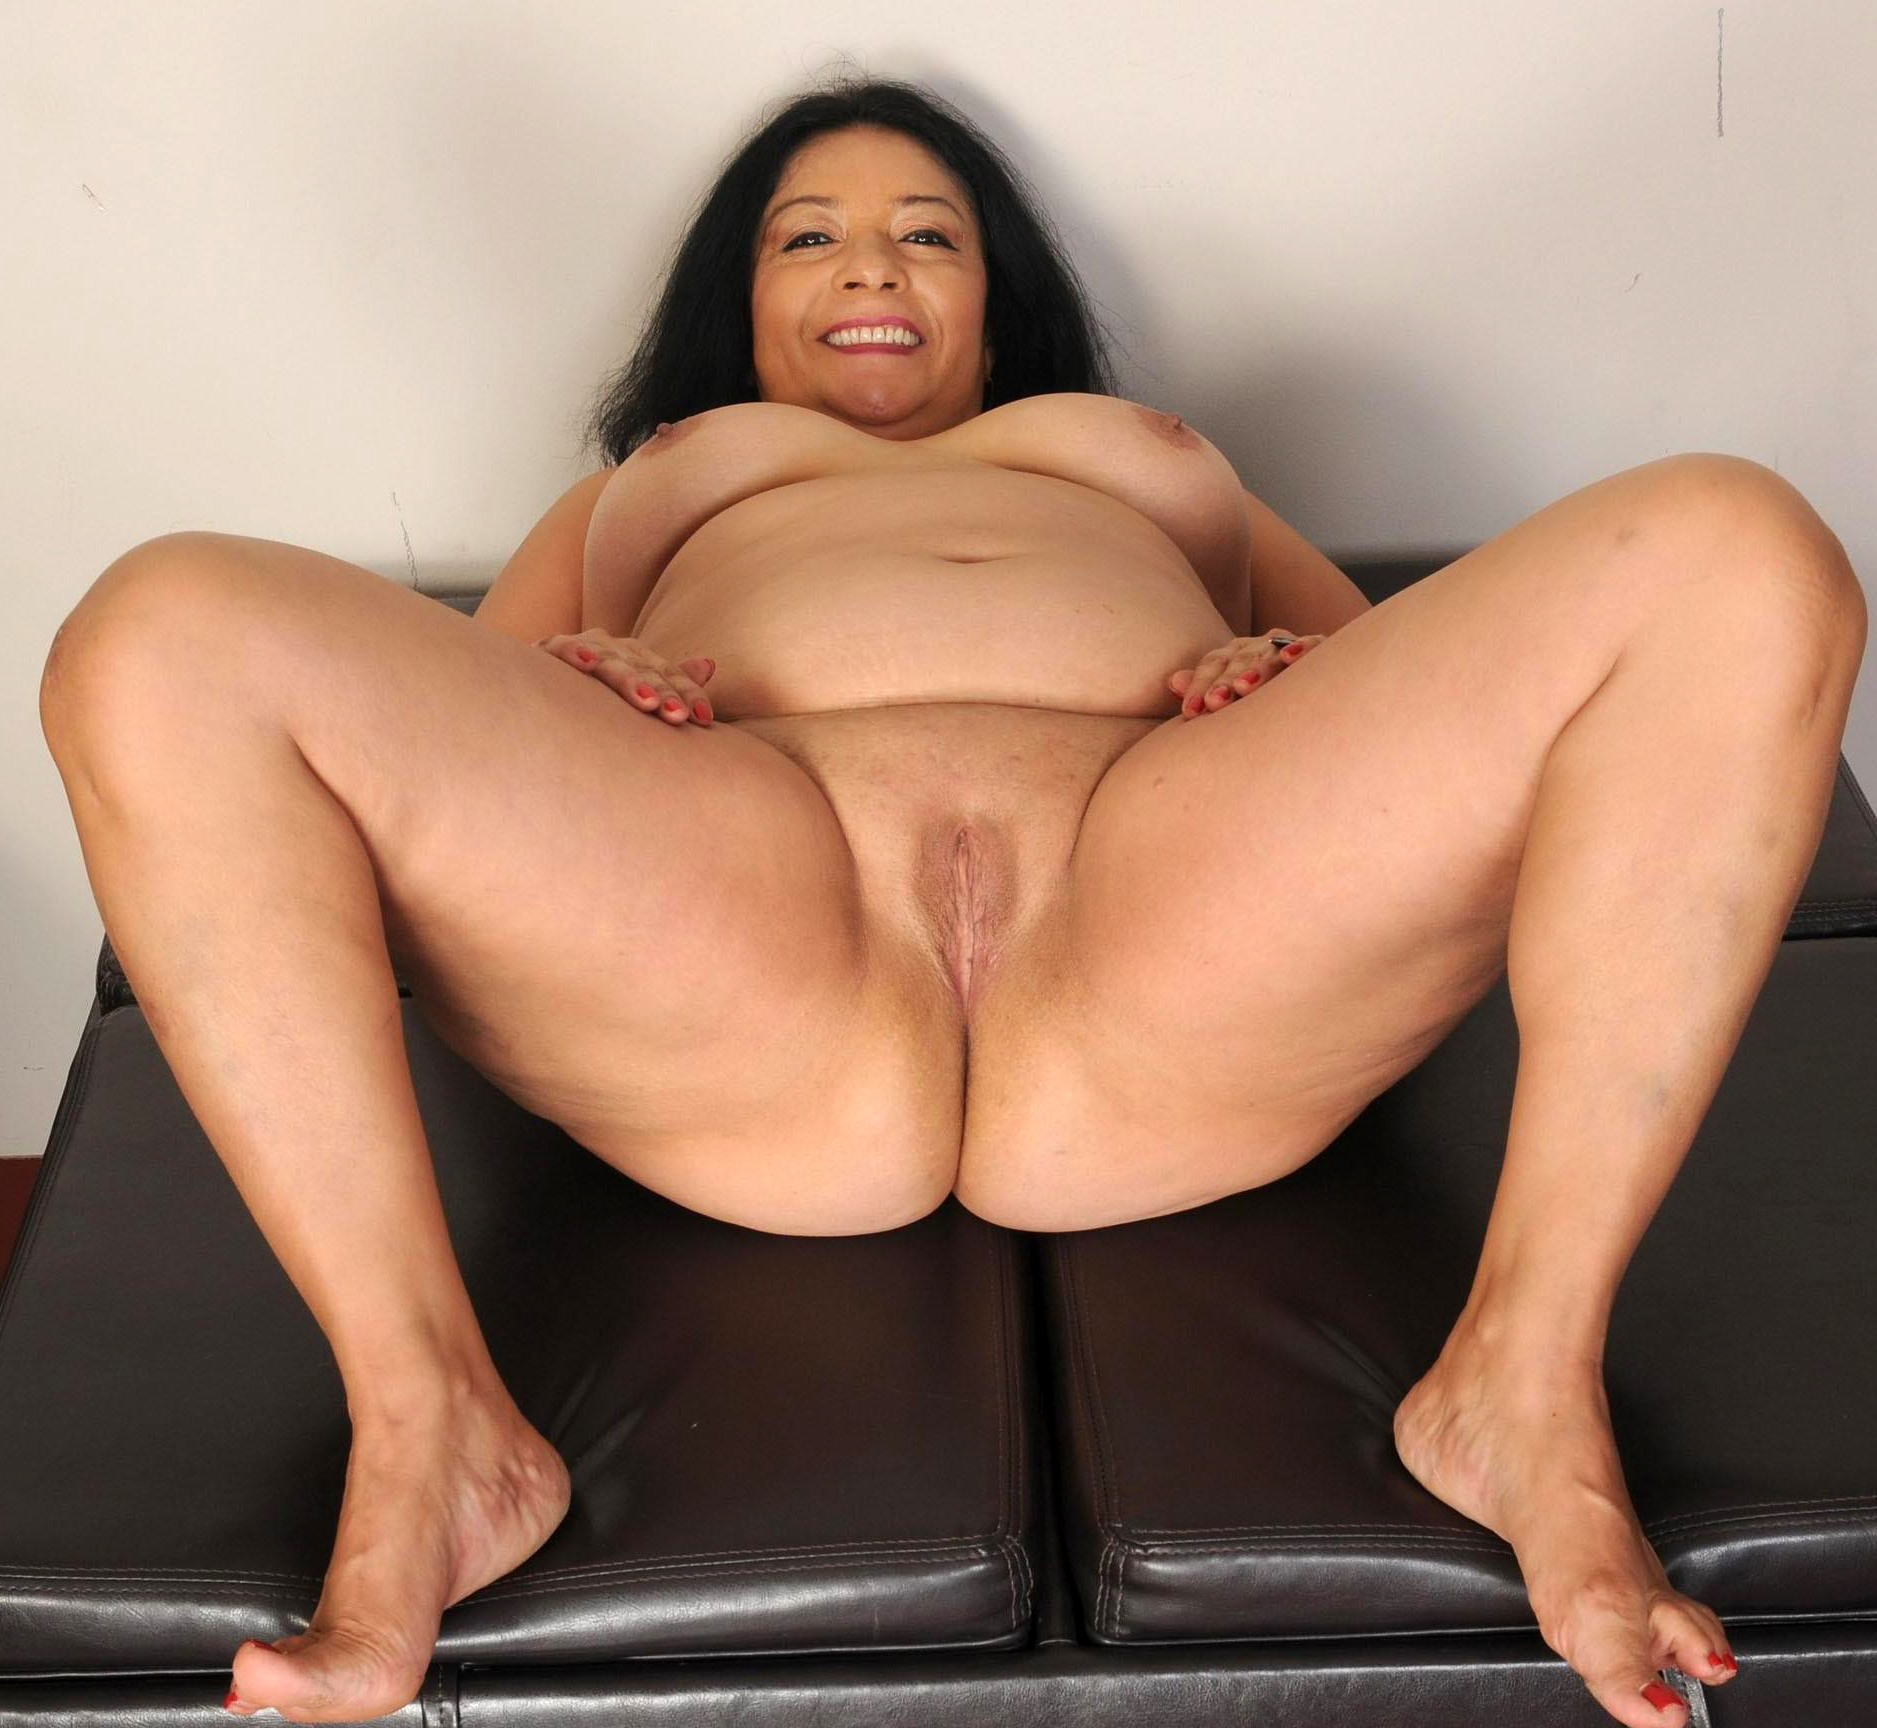 Latinasnude